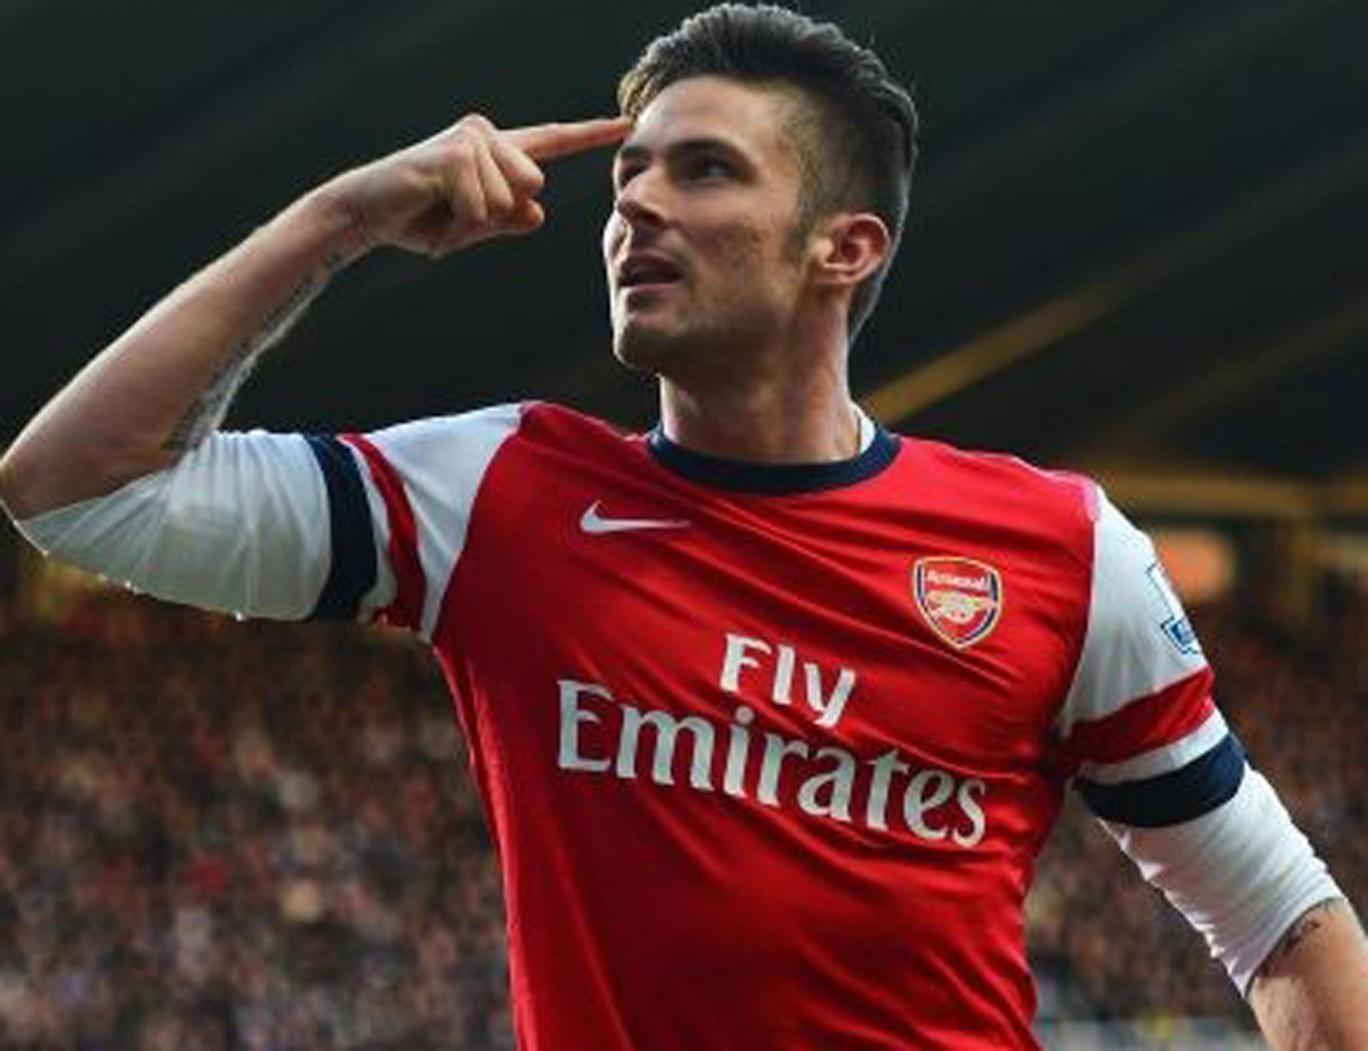 Arsenal's Olivier Giroud celebrates his goal against Newcastle